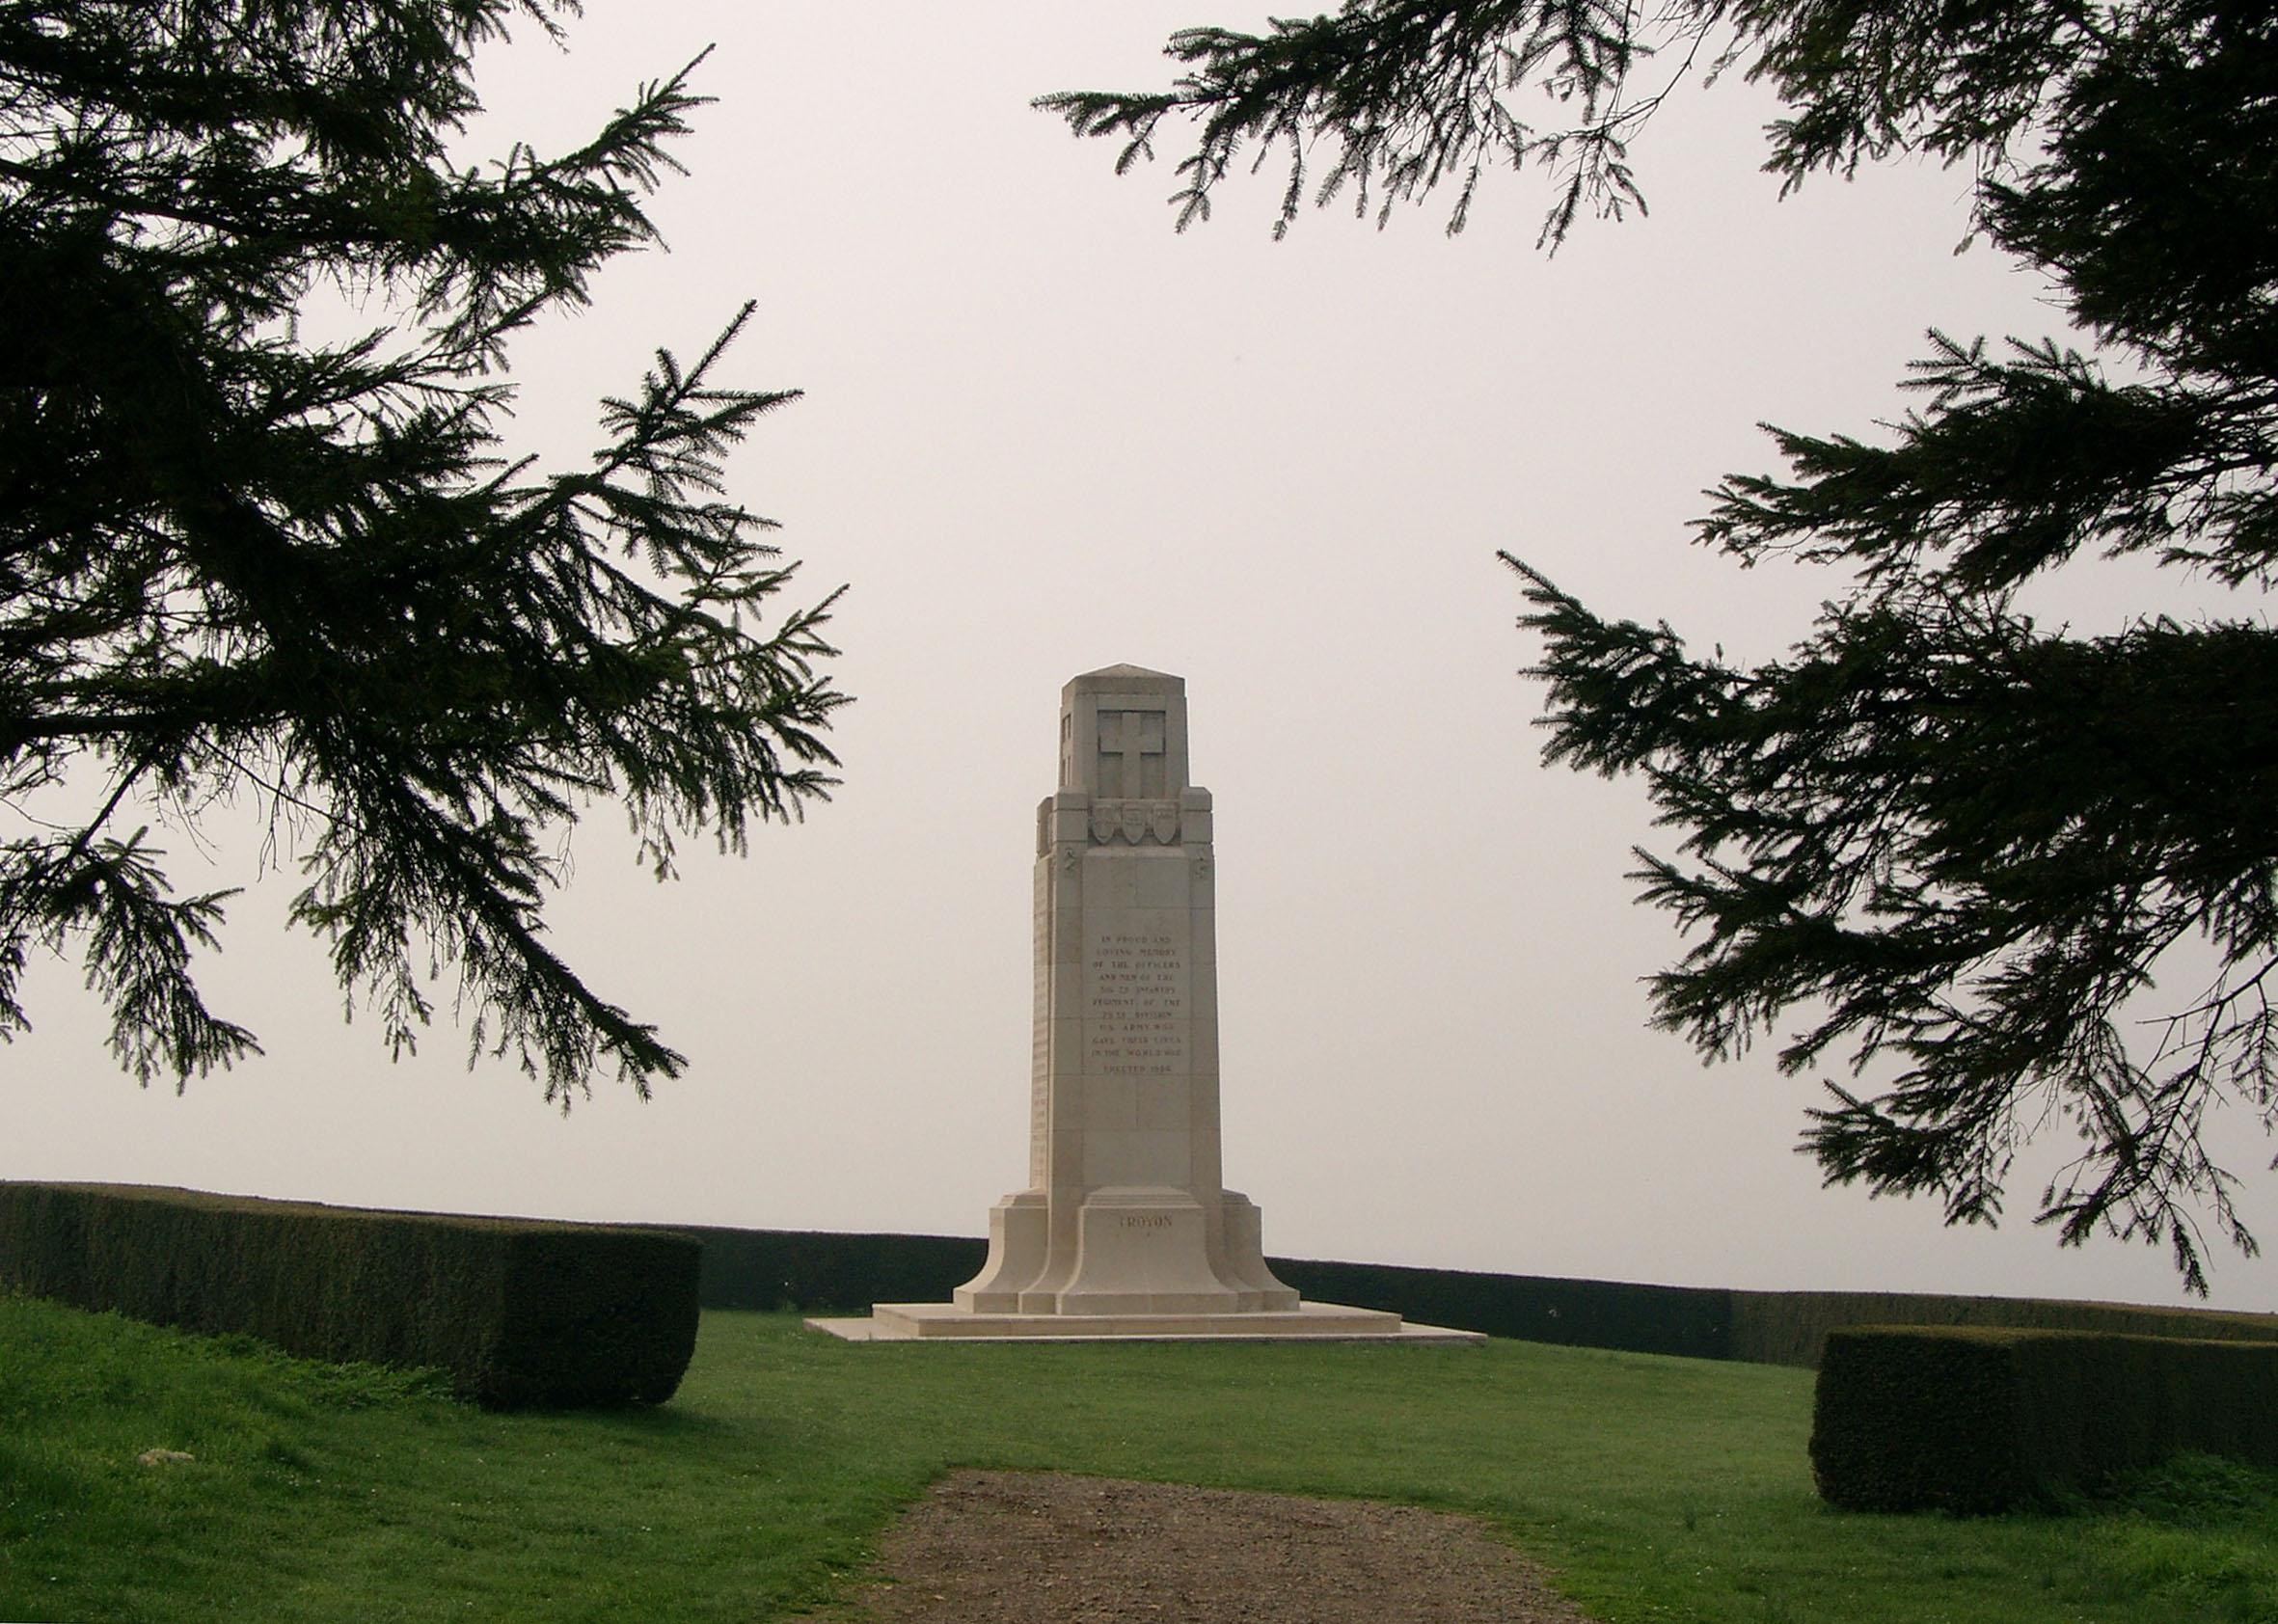 Monument to 316th US Infantry Regiment at La Gande Montagne